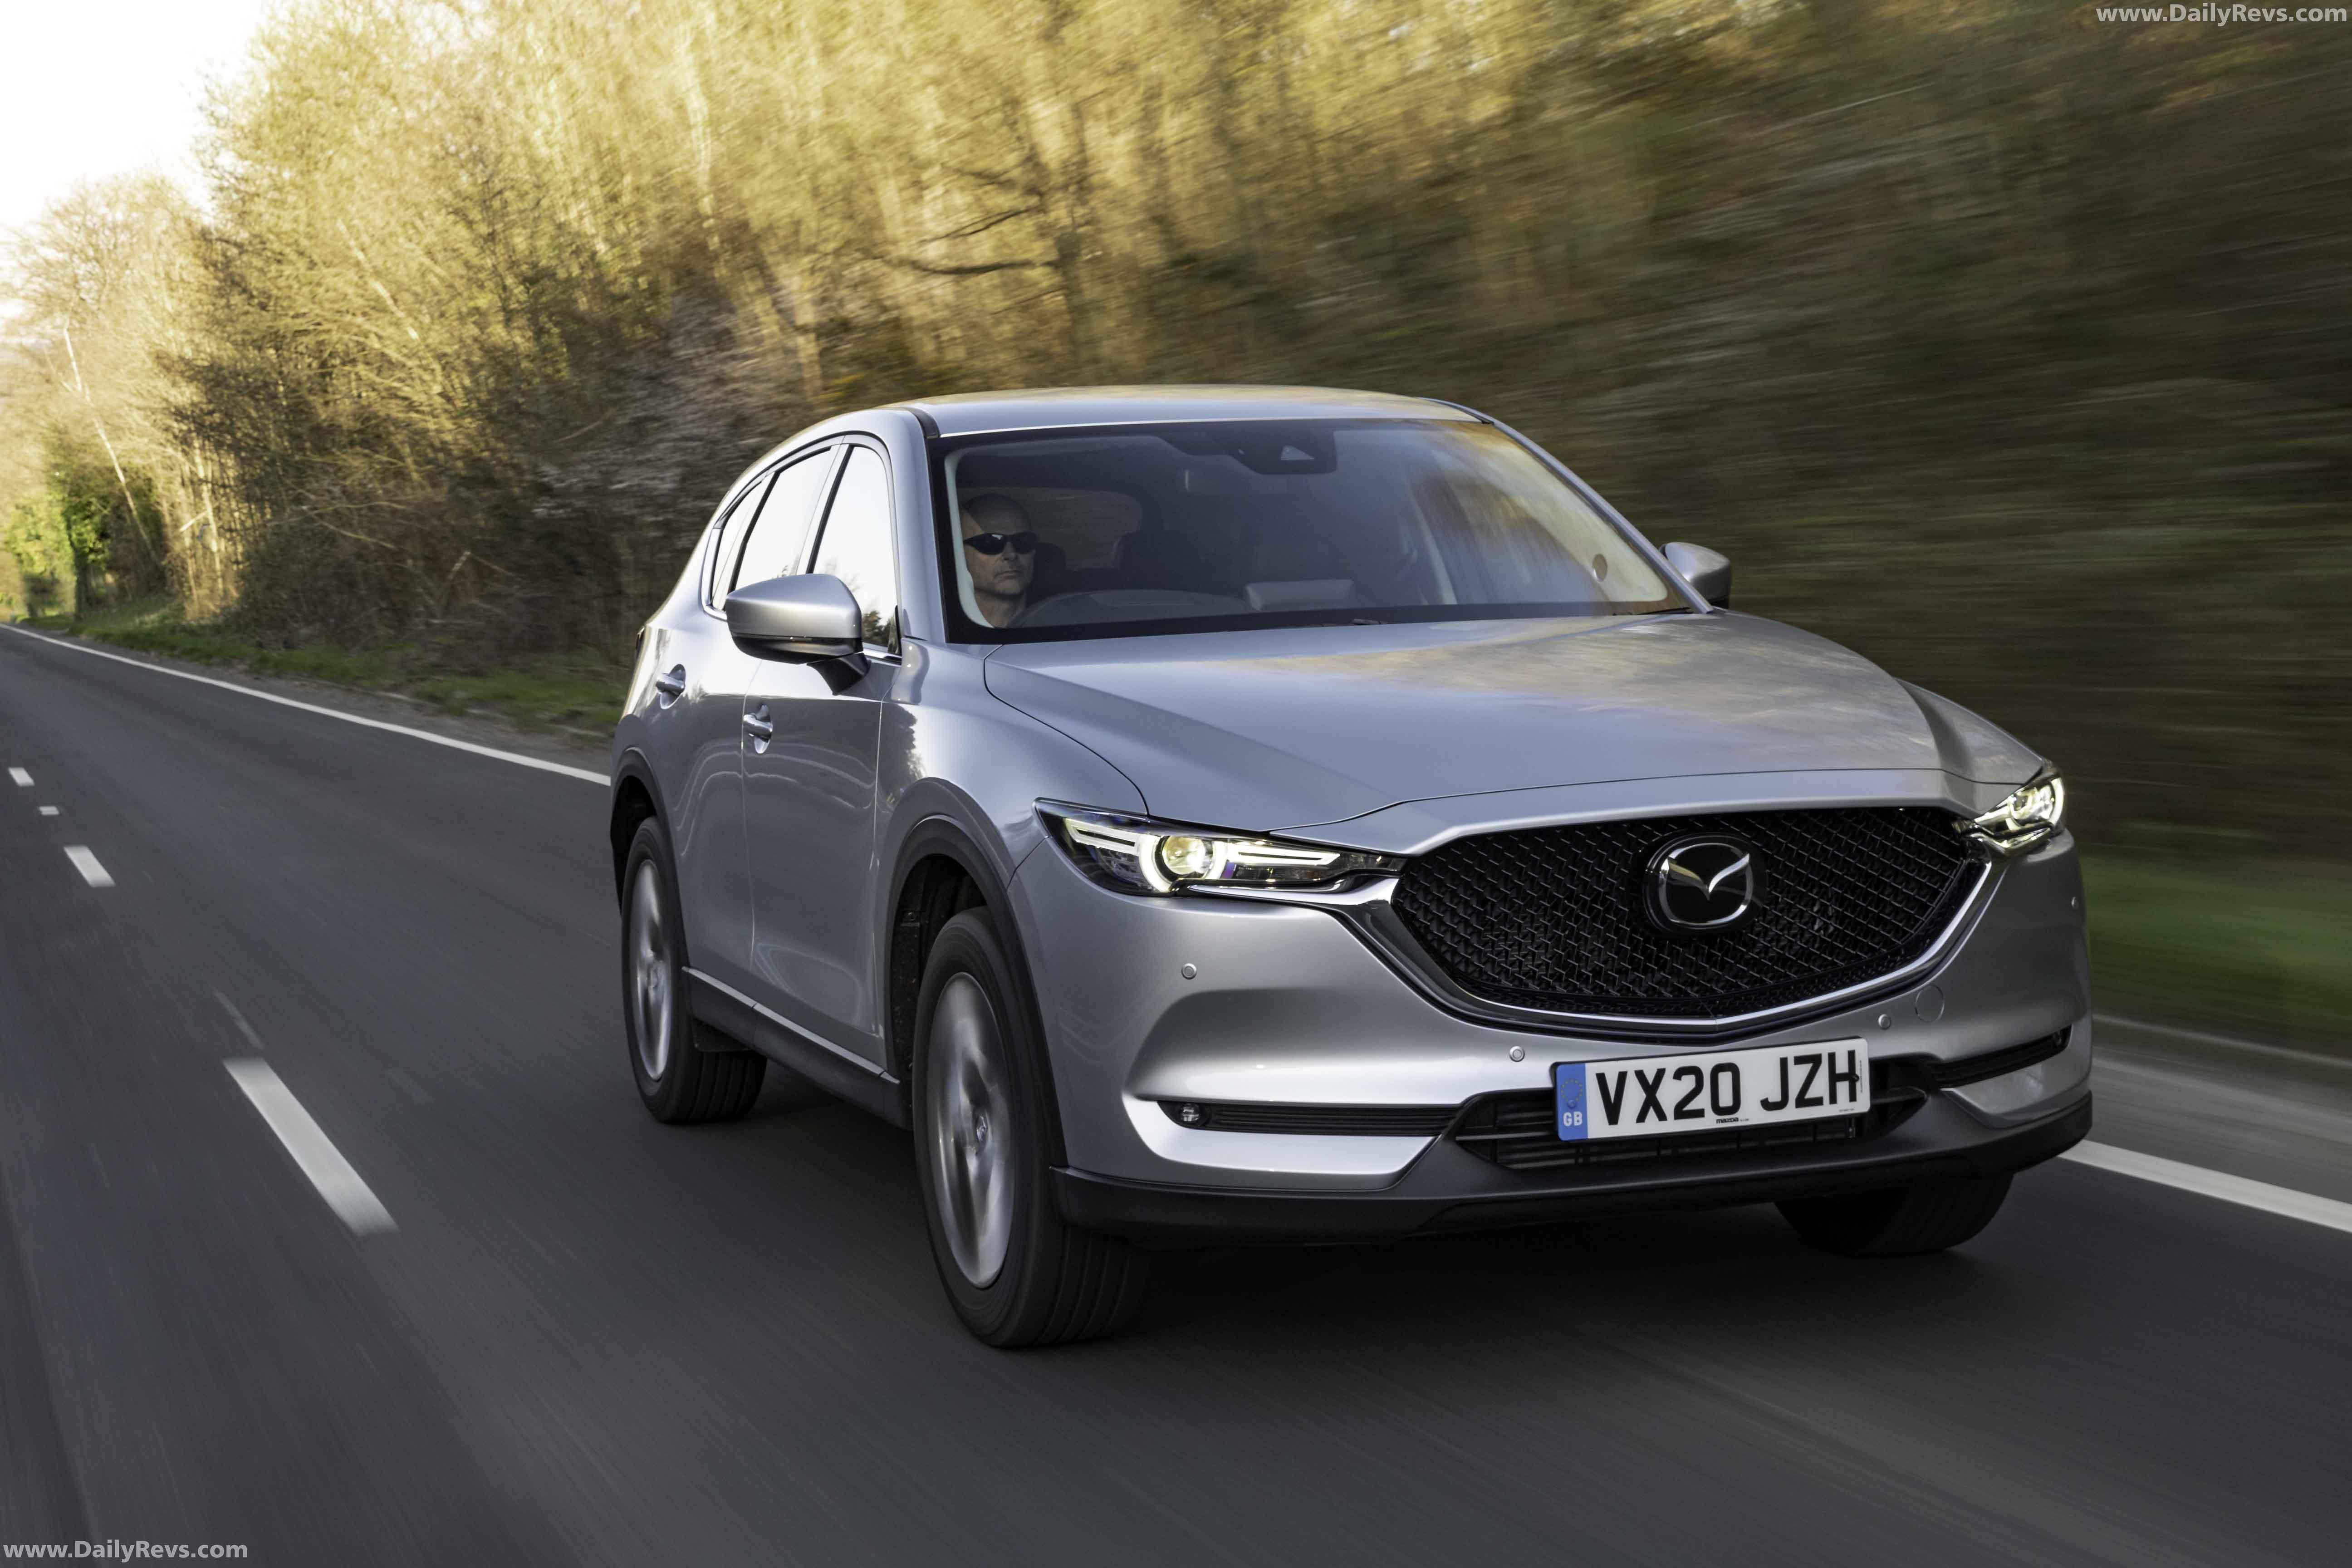 Kekurangan Mazda Cx 5 Skyactiv Review